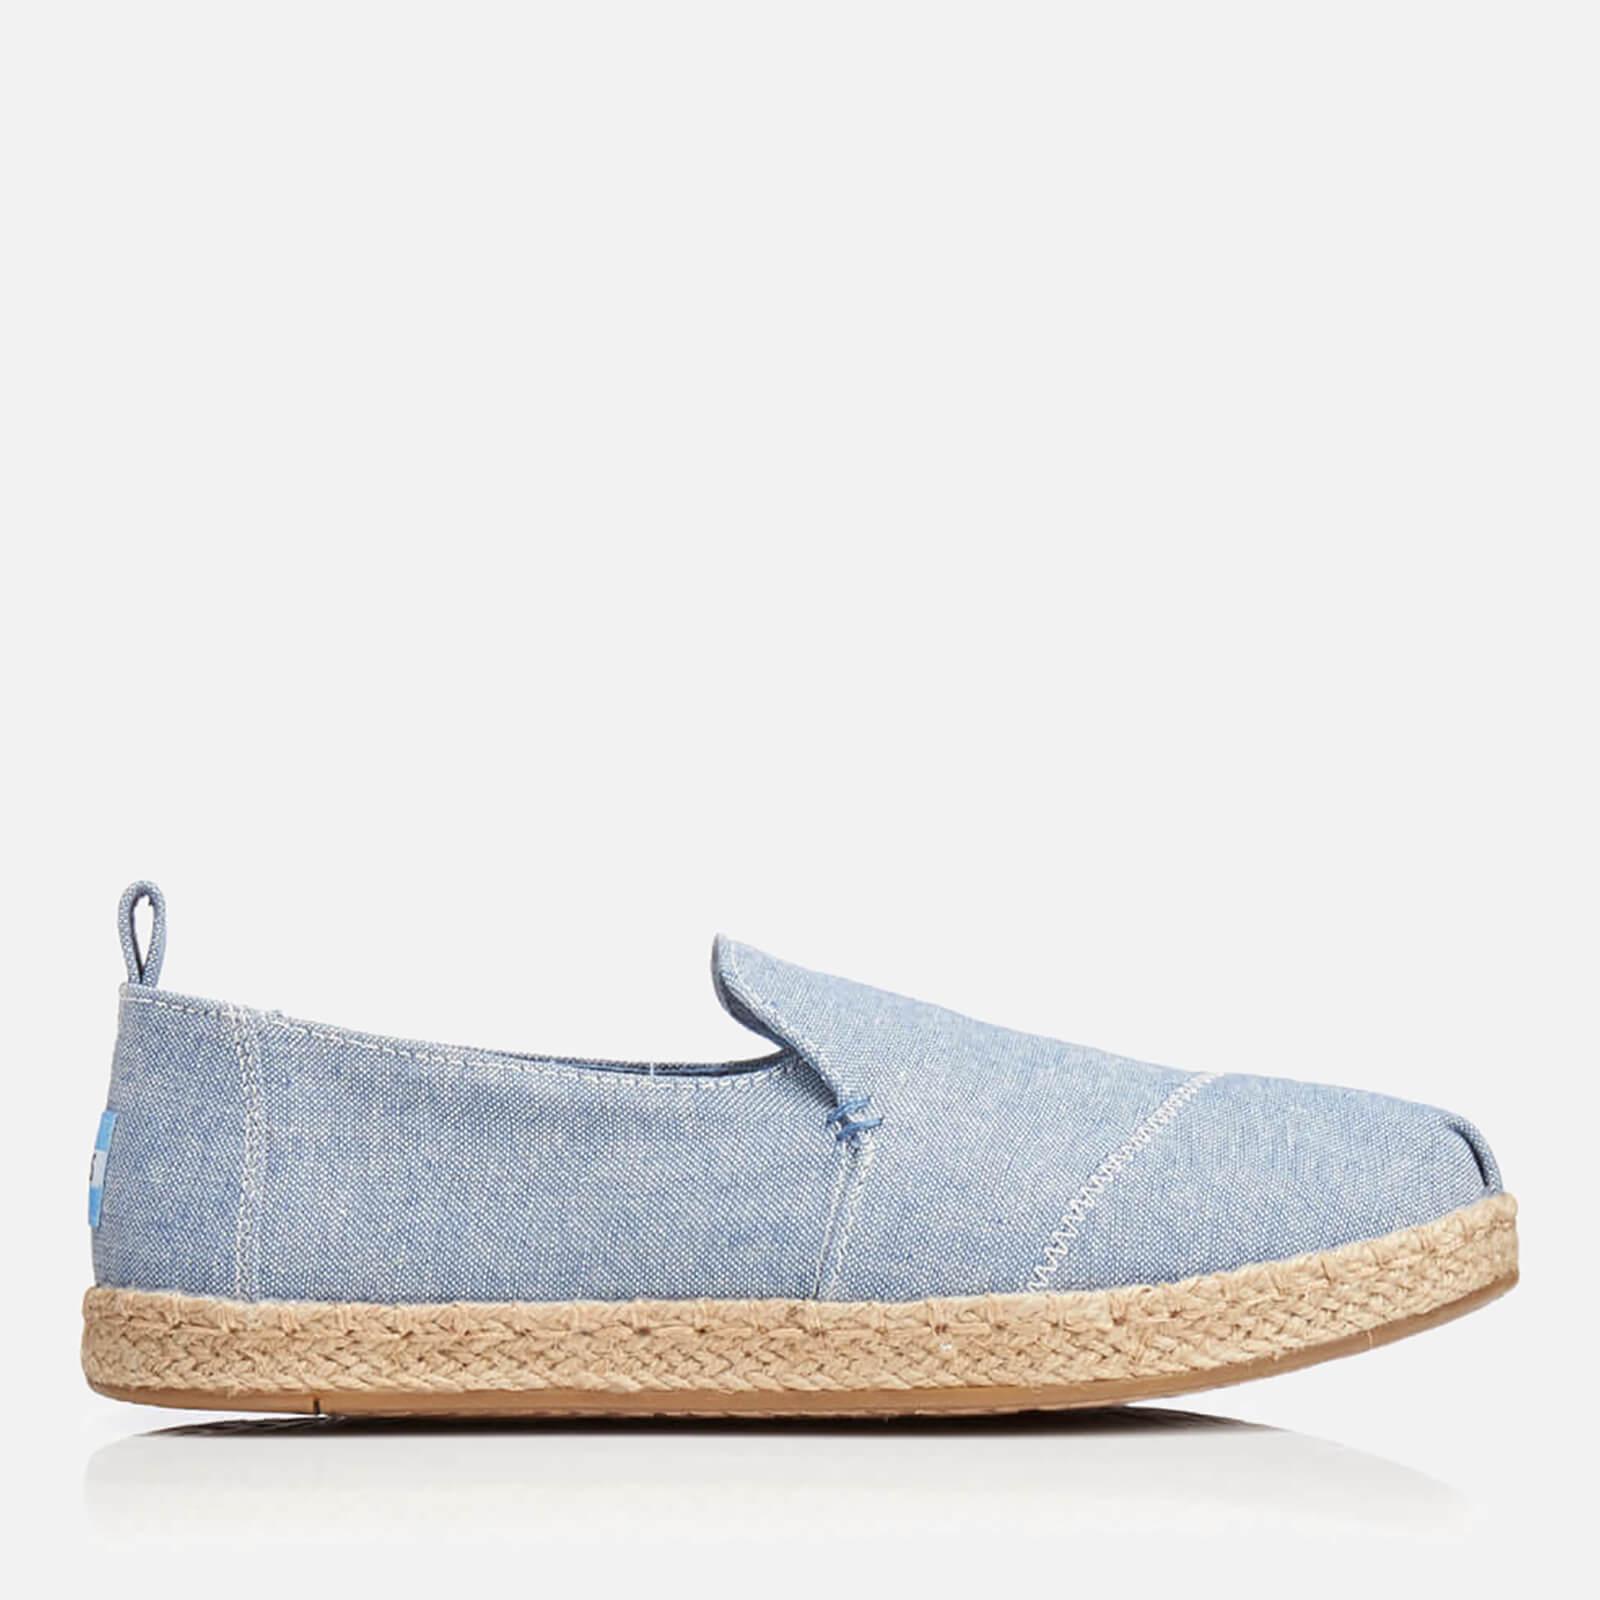 f51bb7ee5 TOMS Women's Deconstructed Alpargata Chambray Espadrilles - Blue Womens  Footwear | TheHut.com